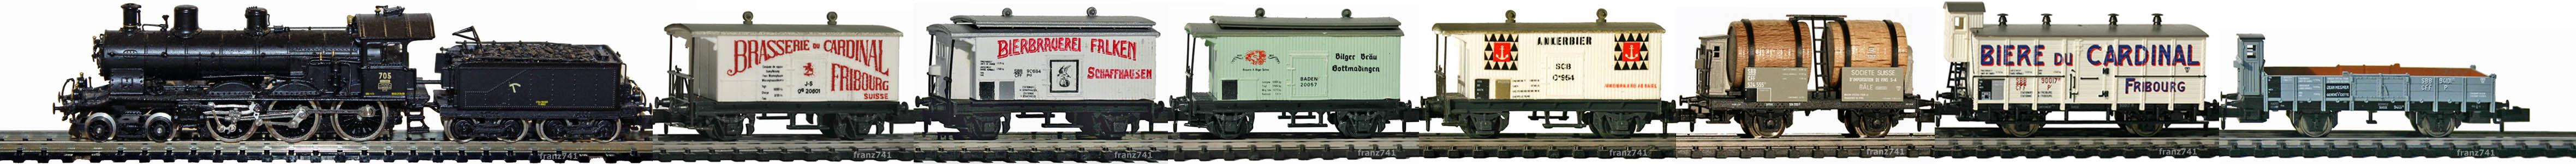 Epoche-I-SBB-Zugskomposition-Damflok-A-3-5-private-Gueterwagen